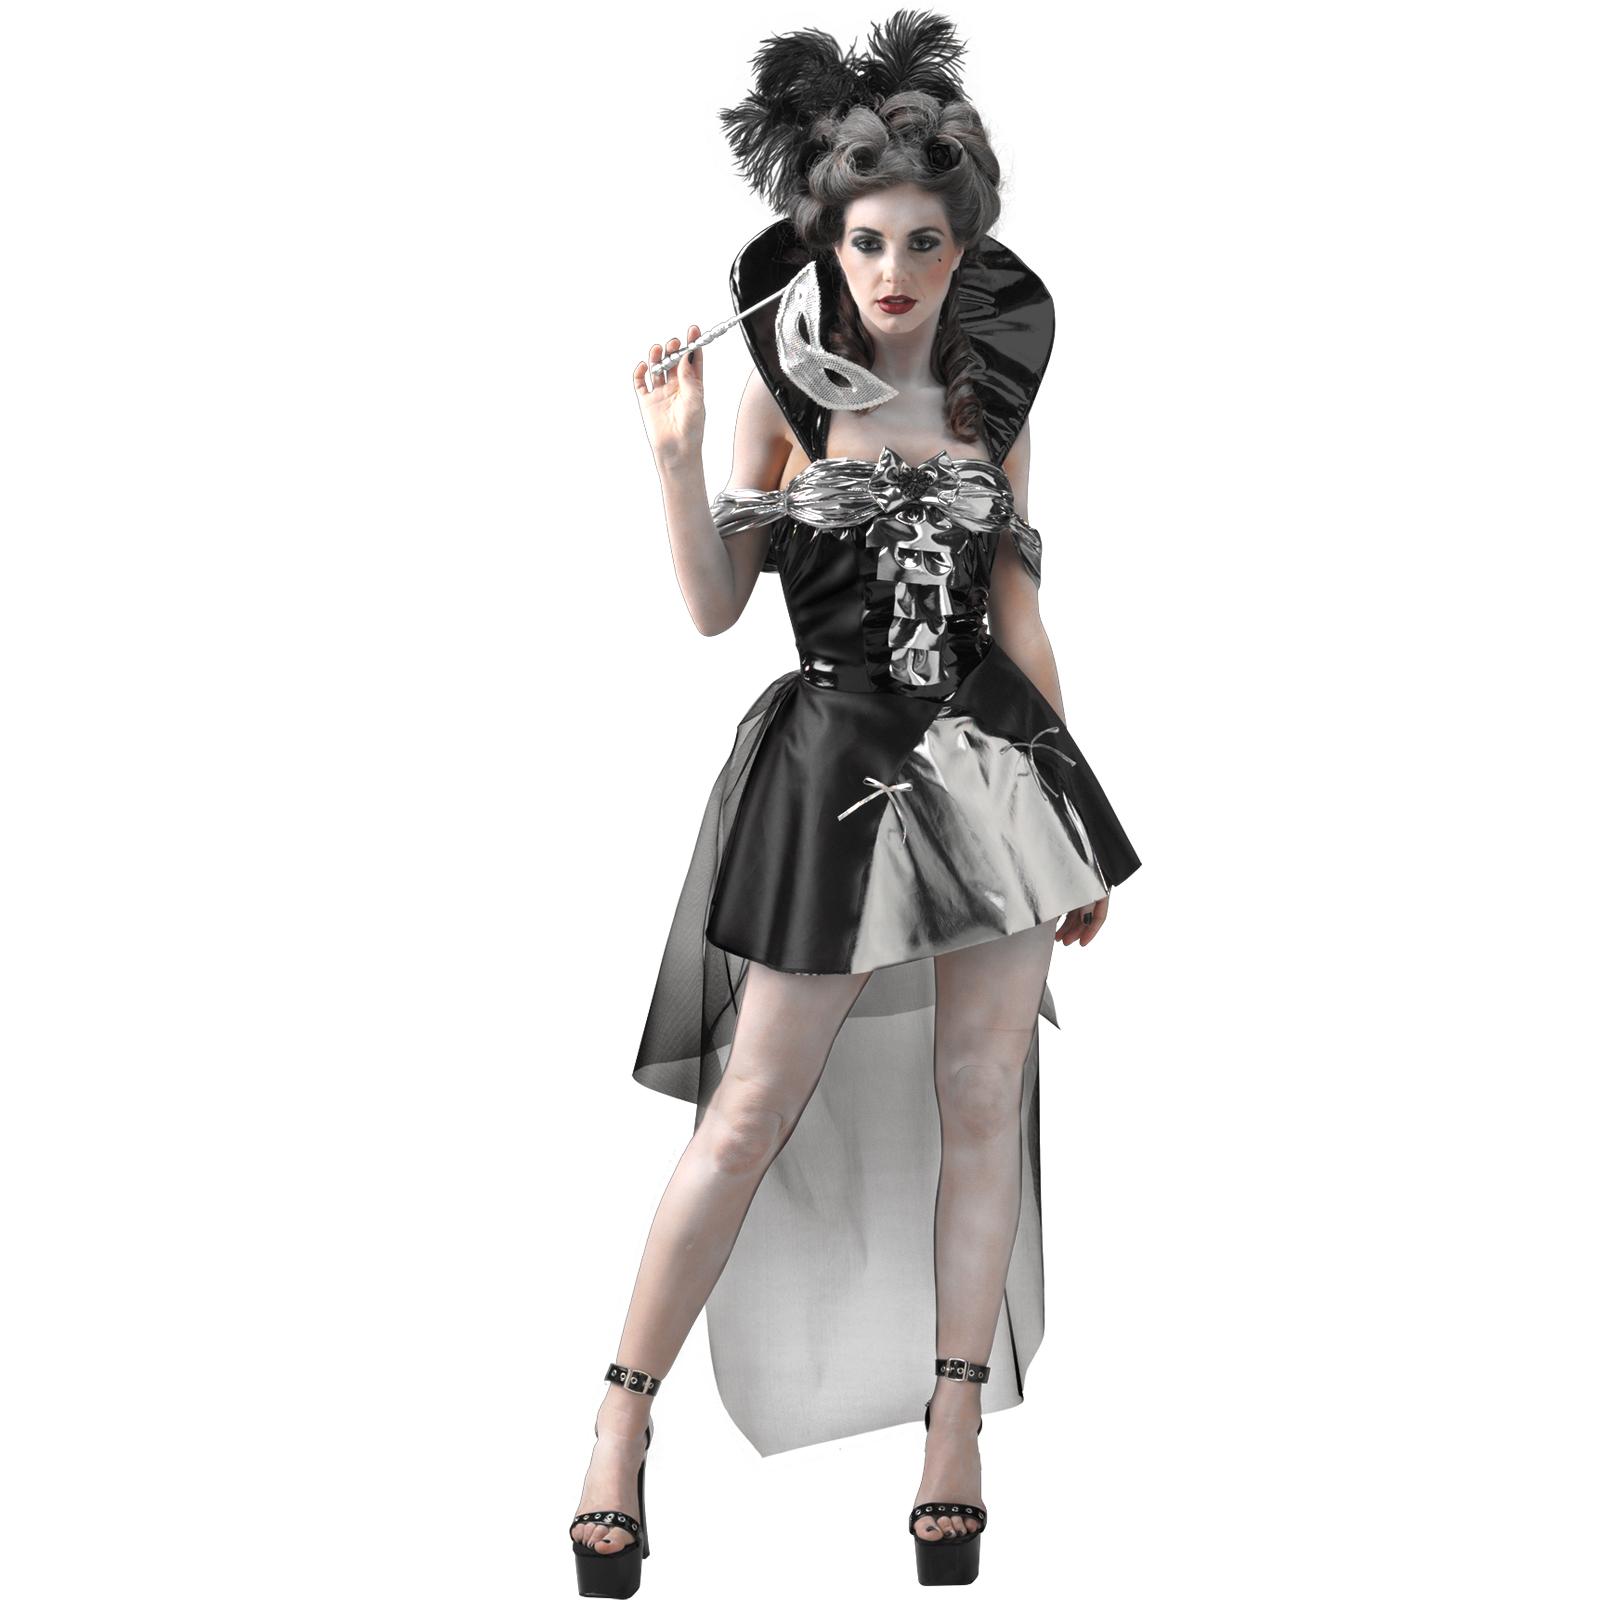 8f74fca9e934c Masquerade Ball Costumes For Men Masquerade Ball Princess AdultMasquerade Ball  Outfit For Men Sc 1 St Intellego.info